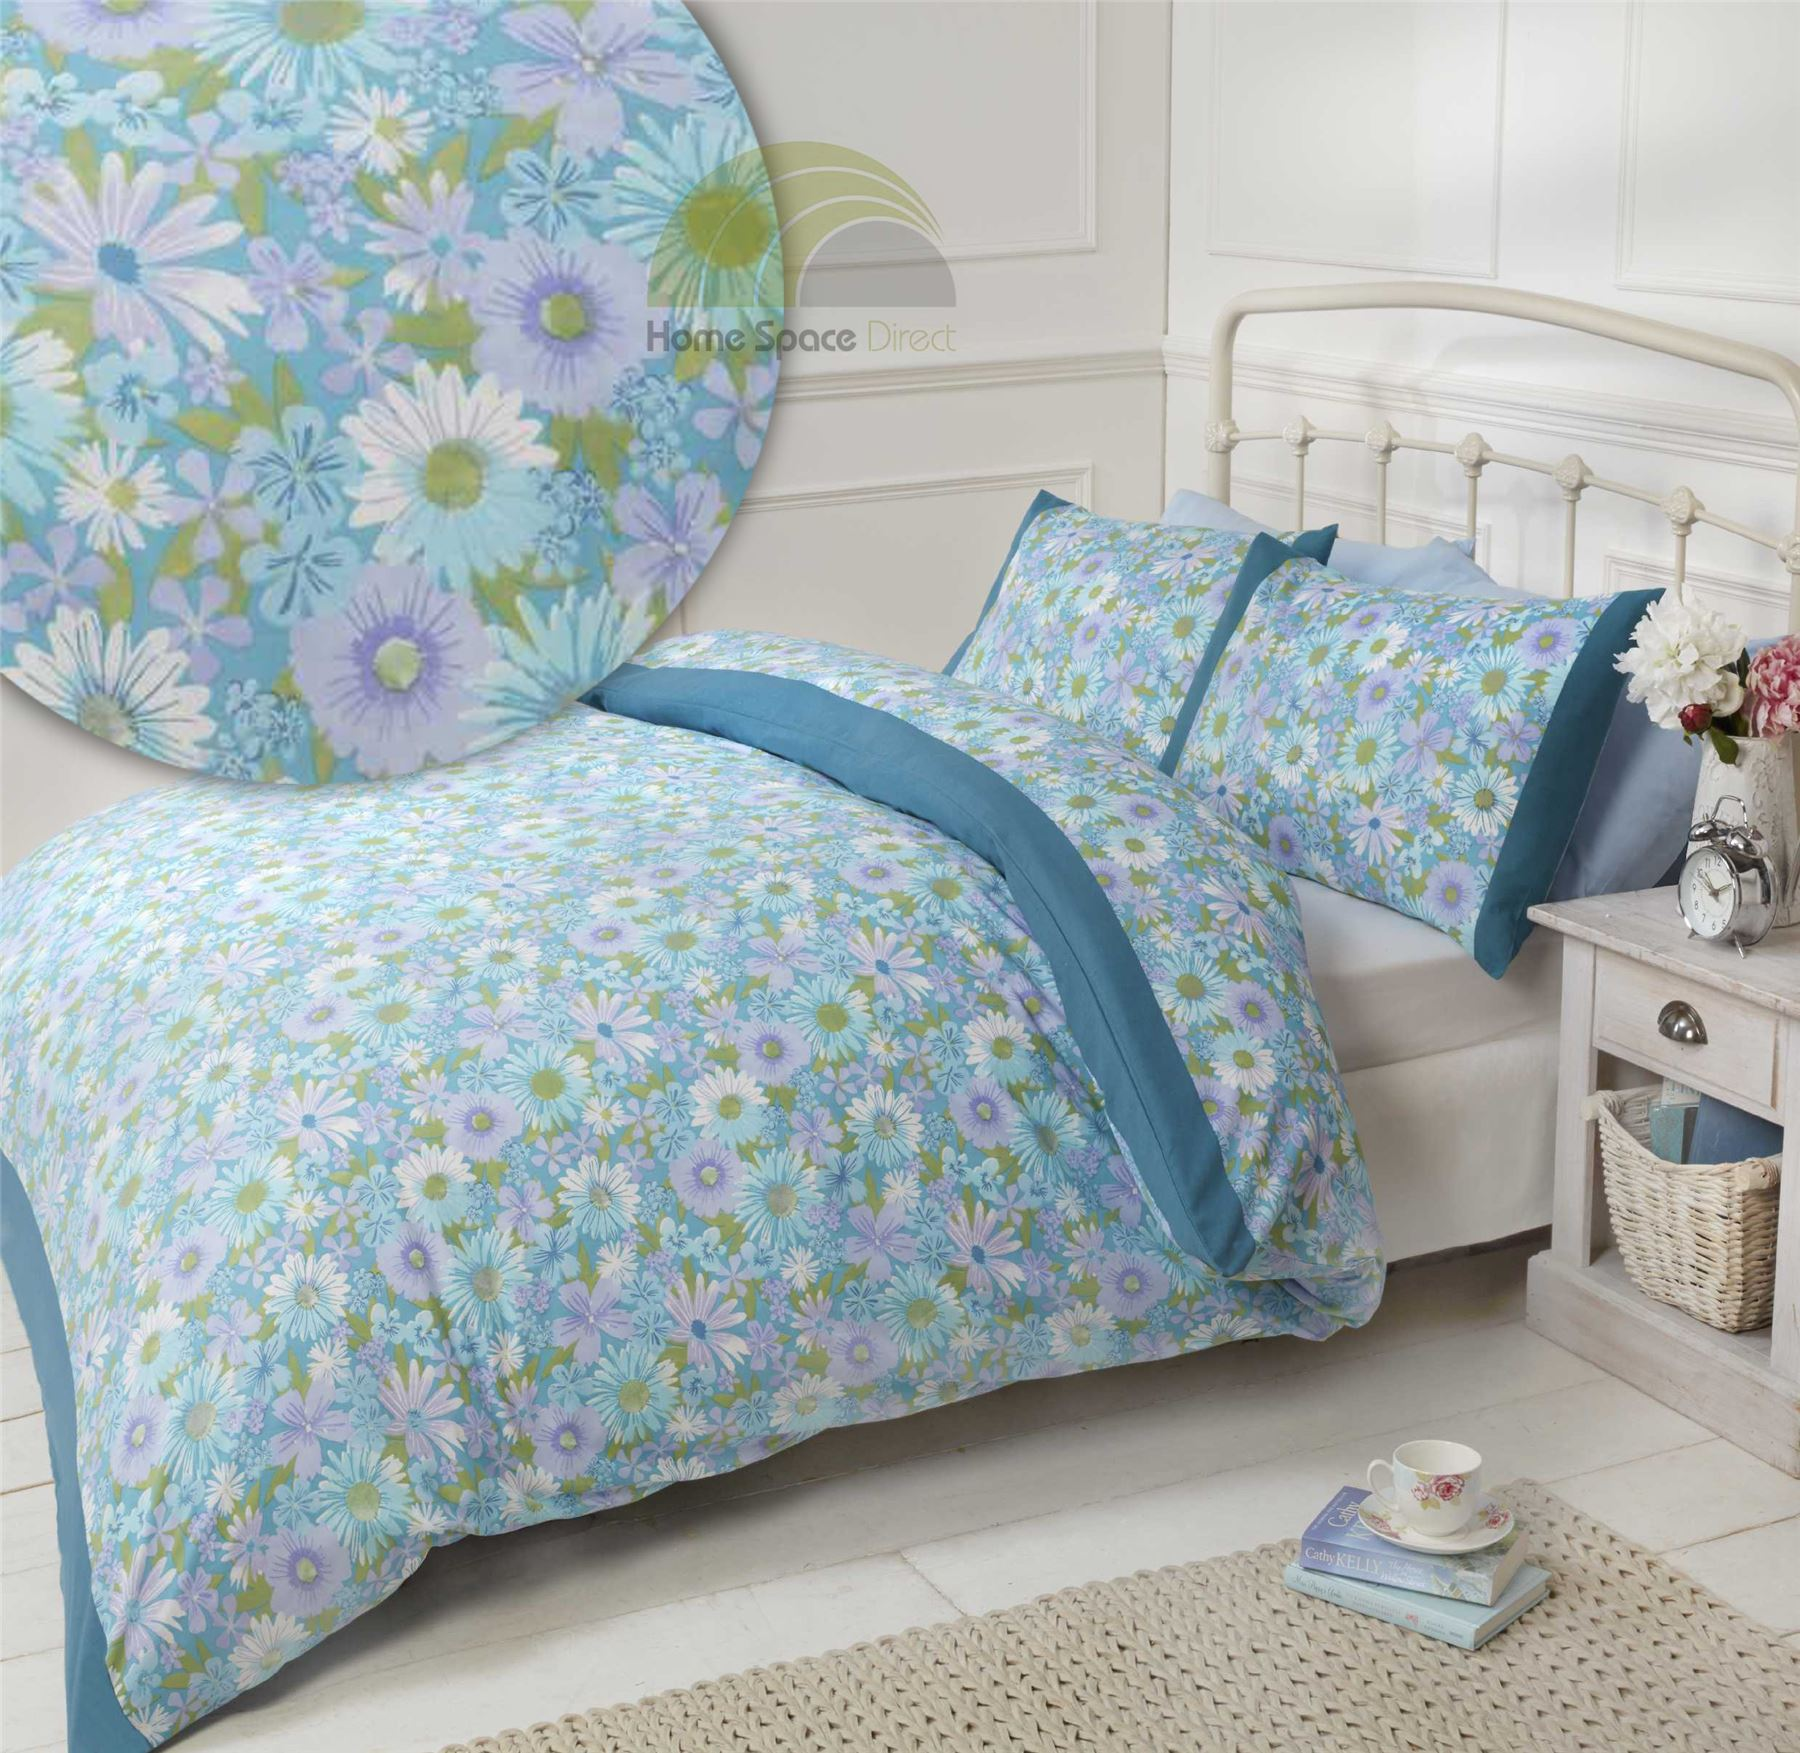 Lyckoax Duvet Cover And Pillowcase S White Lilac: Floral Quilt Duvet Cover & Pillowcase Bedding Bed Set